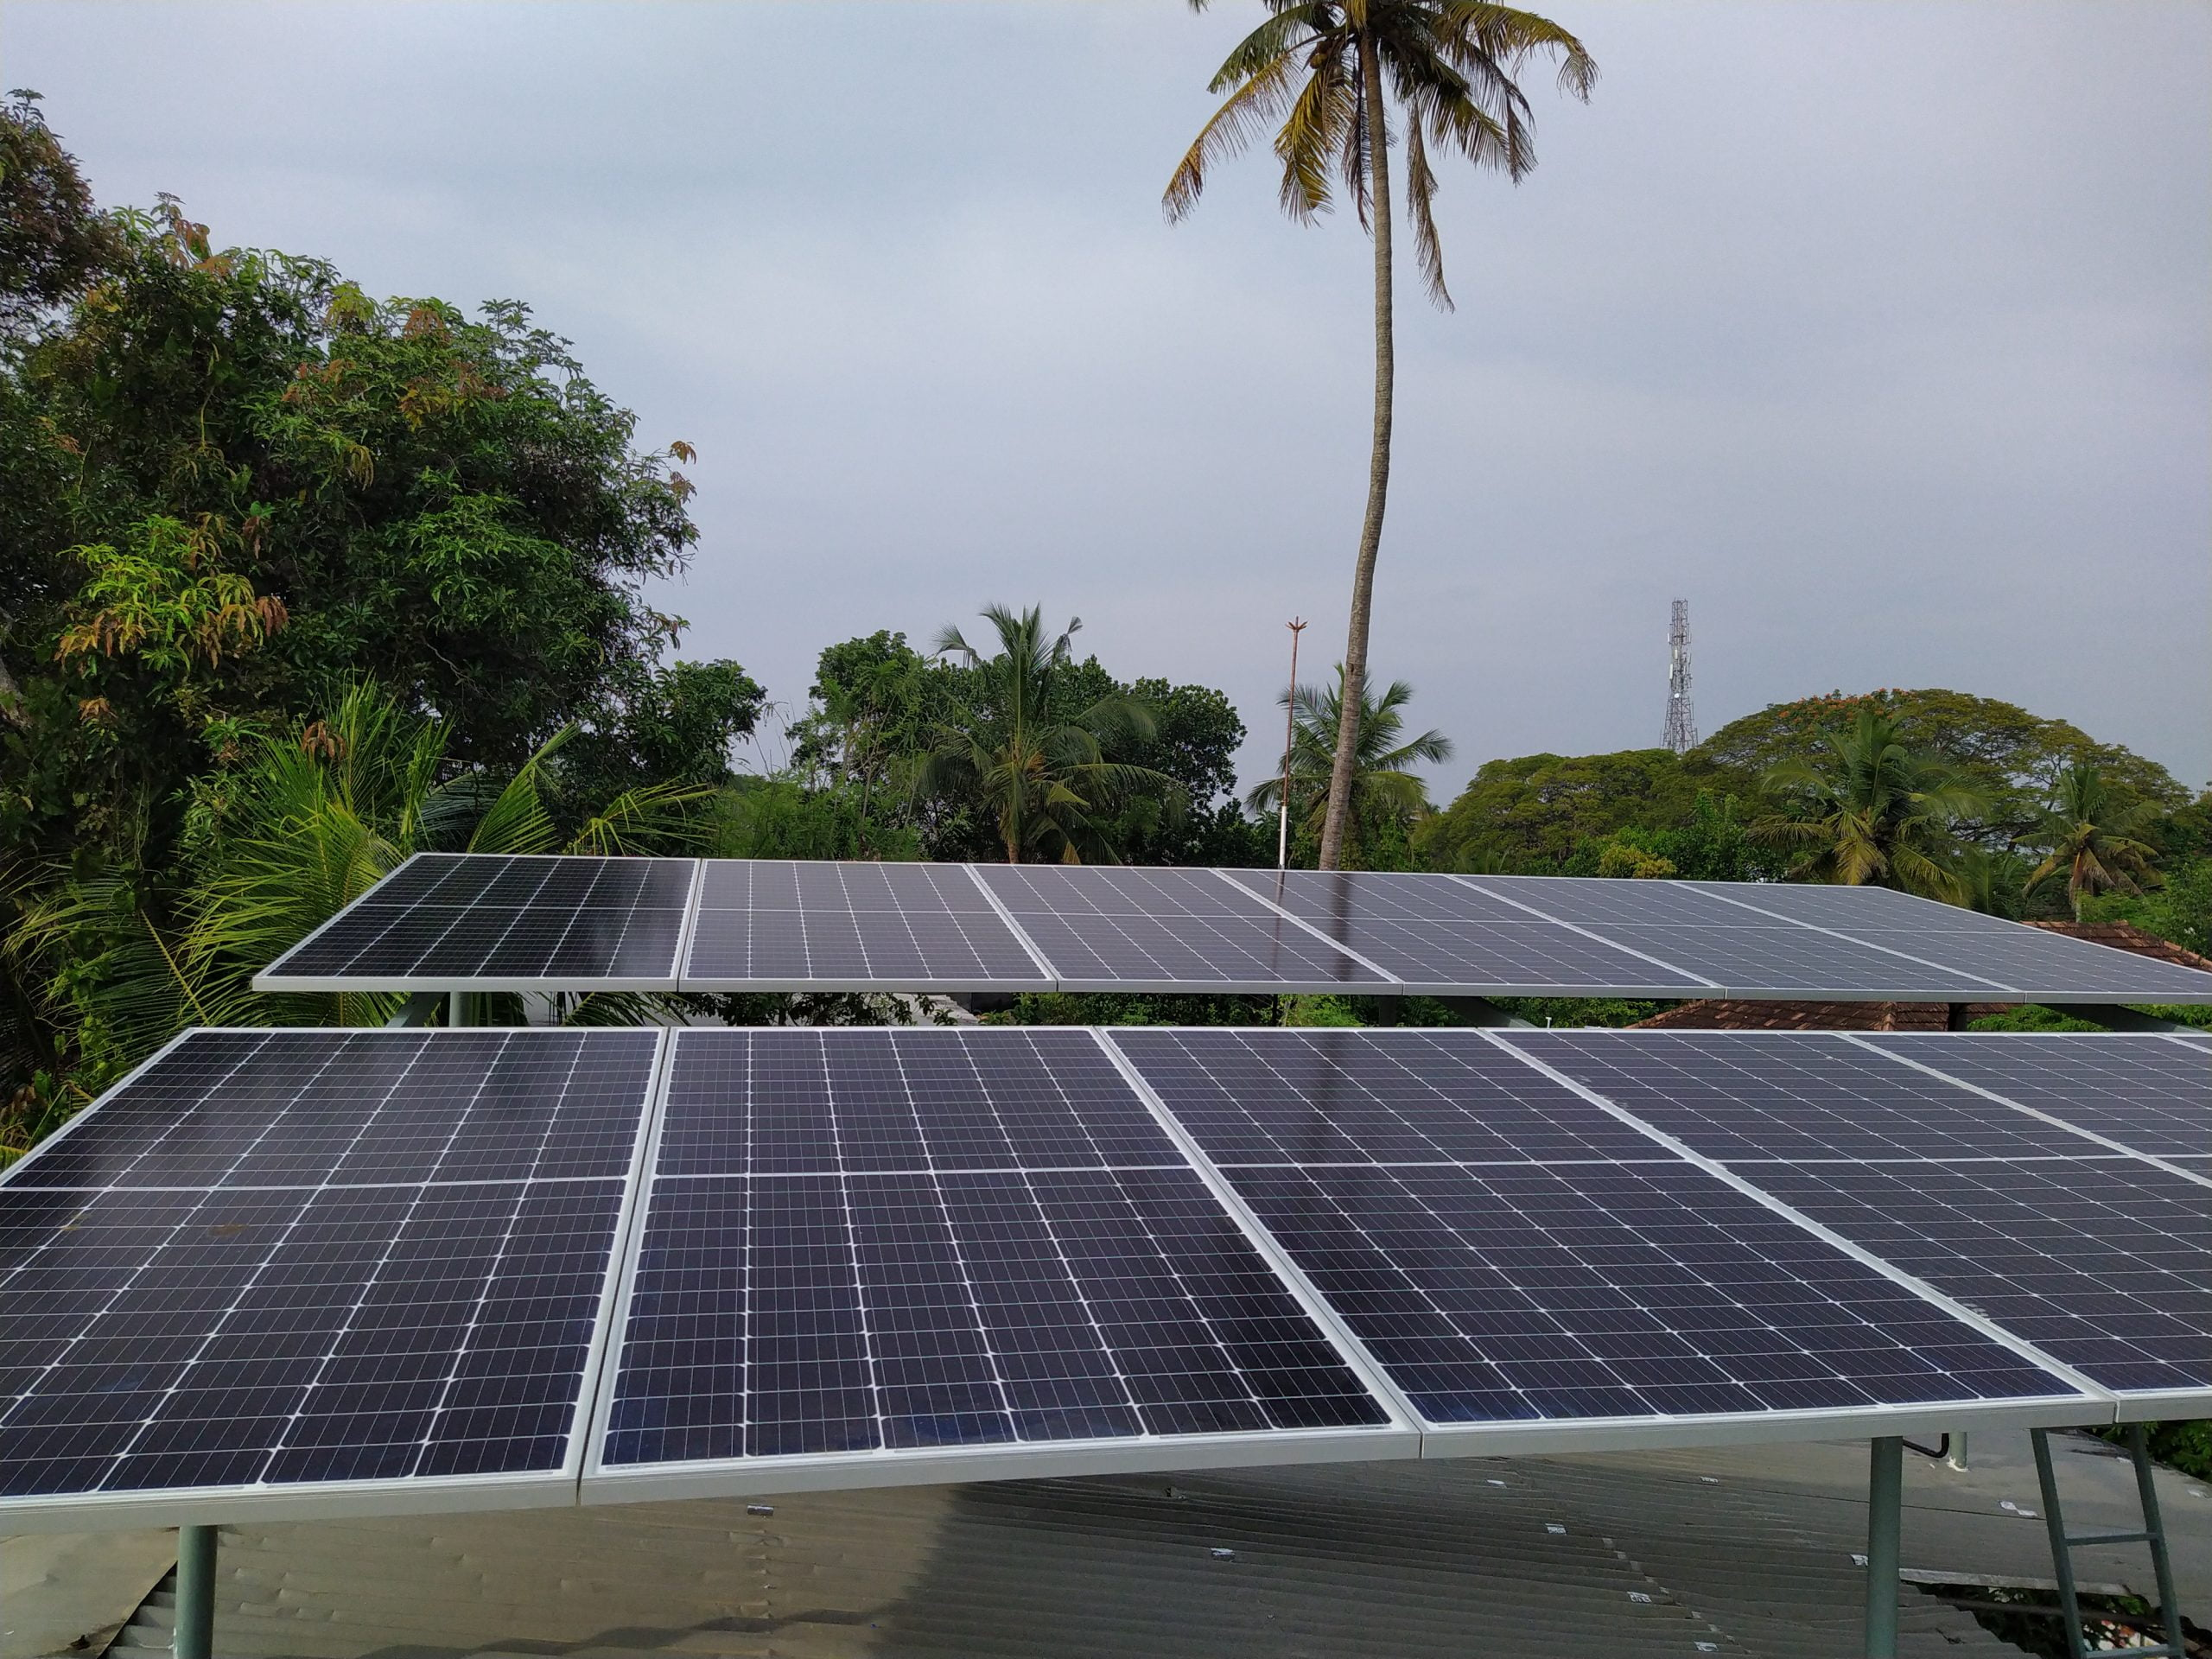 5kW Solar Ongrid Power Plant at Alappuzha